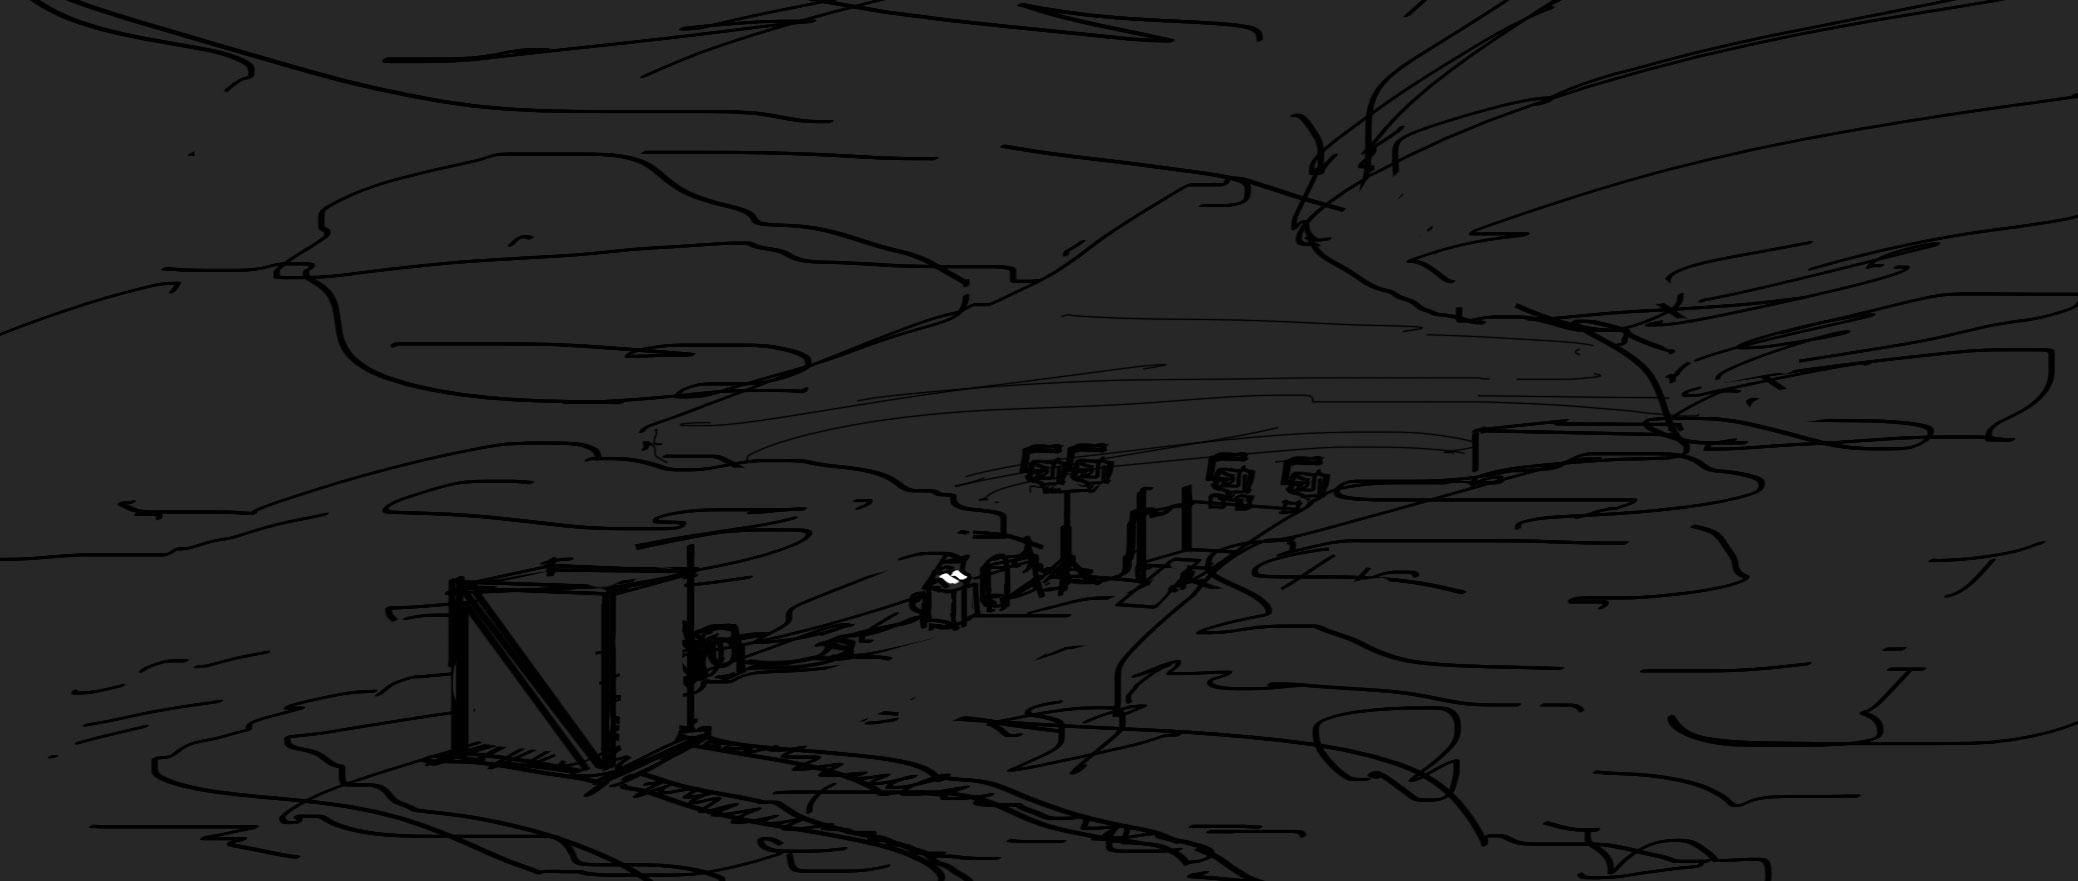 Wraiths_2019Animatic_Thumbsheet-02_90.jpg